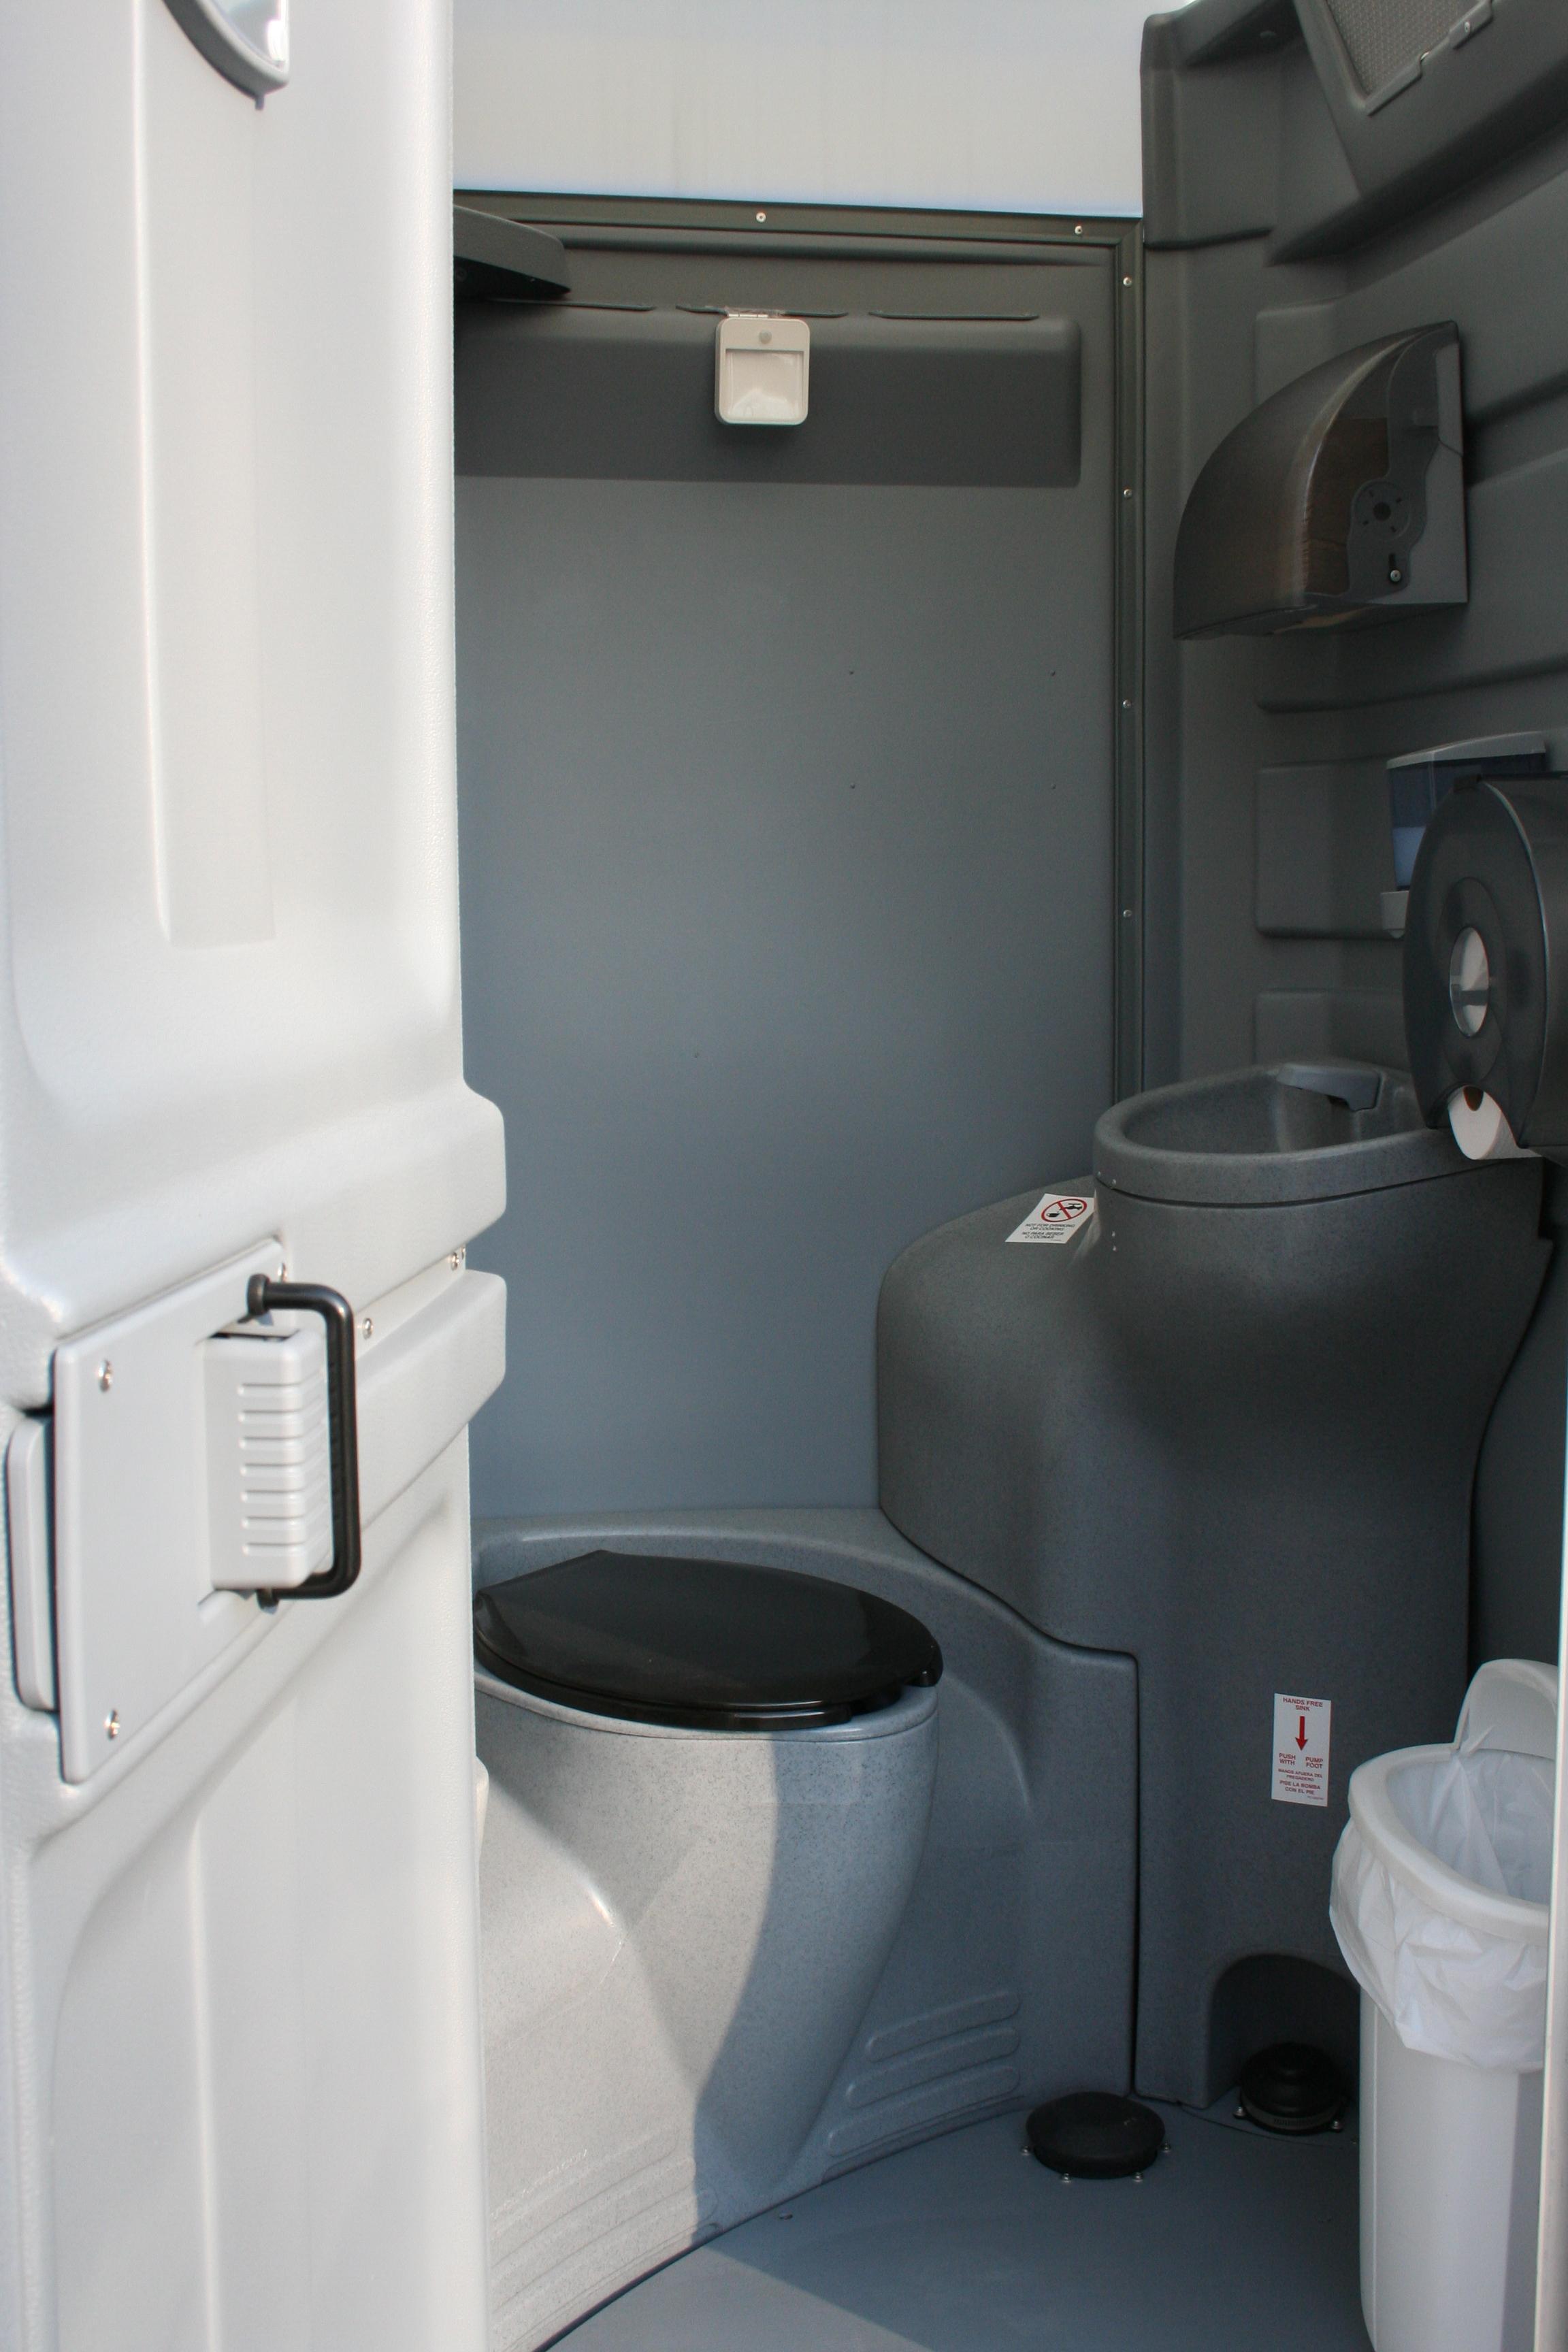 Perth Toilets